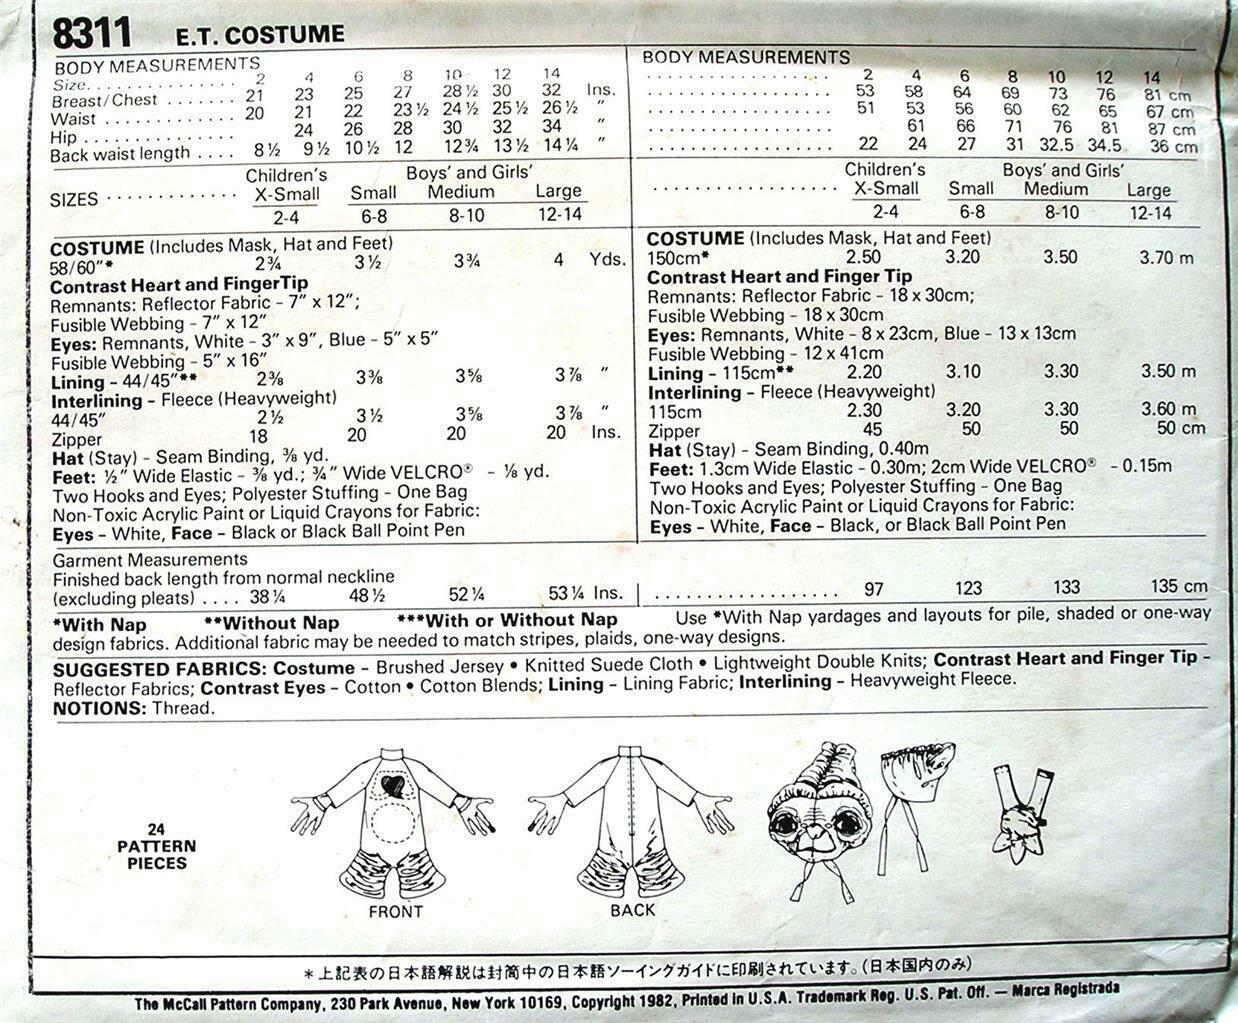 Vintage McCall's Pattern 8311 E.T. Costume Child's Size 2-4 Uncut Complete 1982